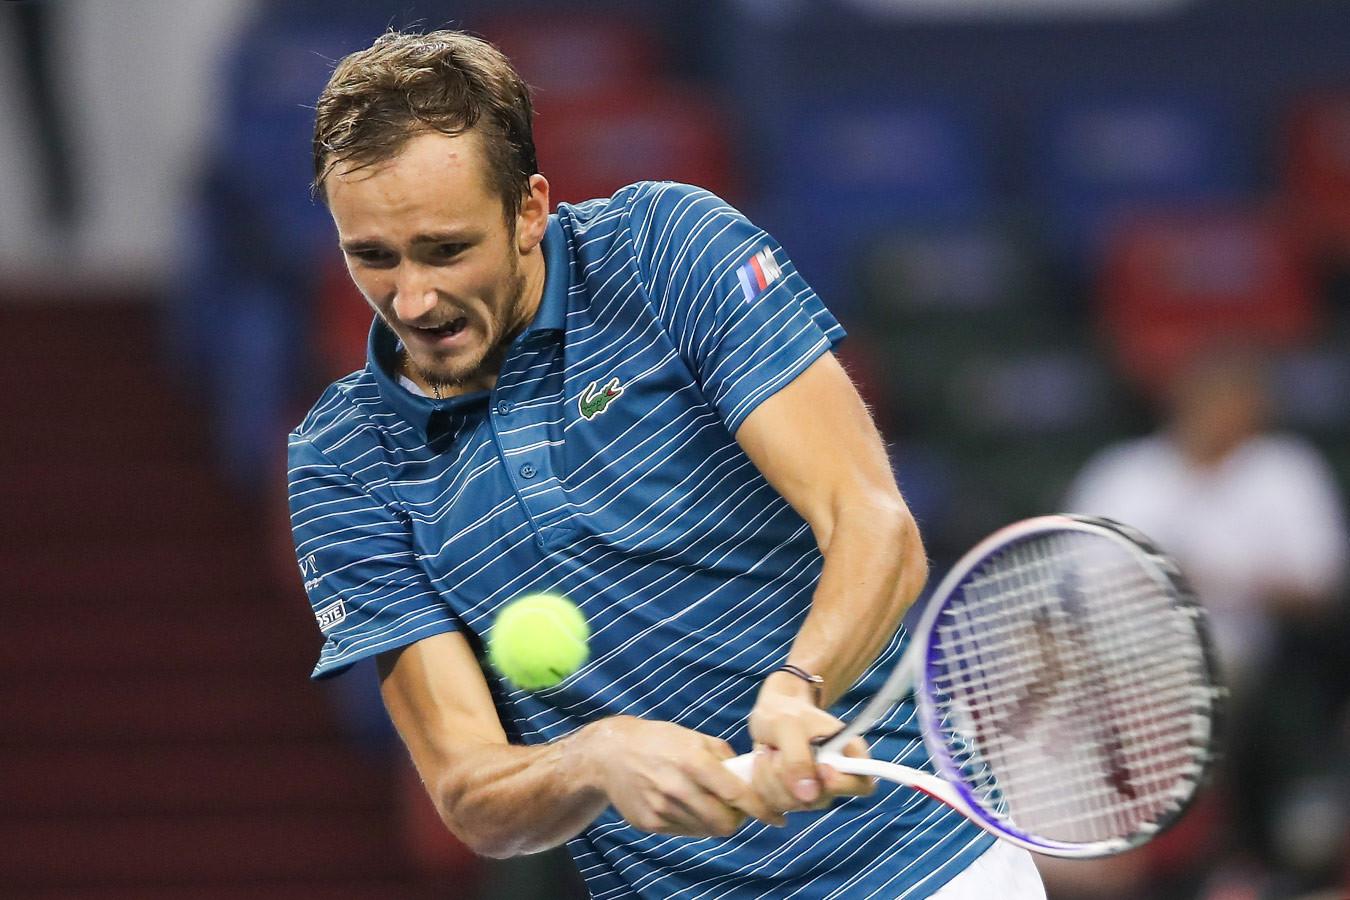 Теннис Шанхай 12.10.2019 смотреть онлайн